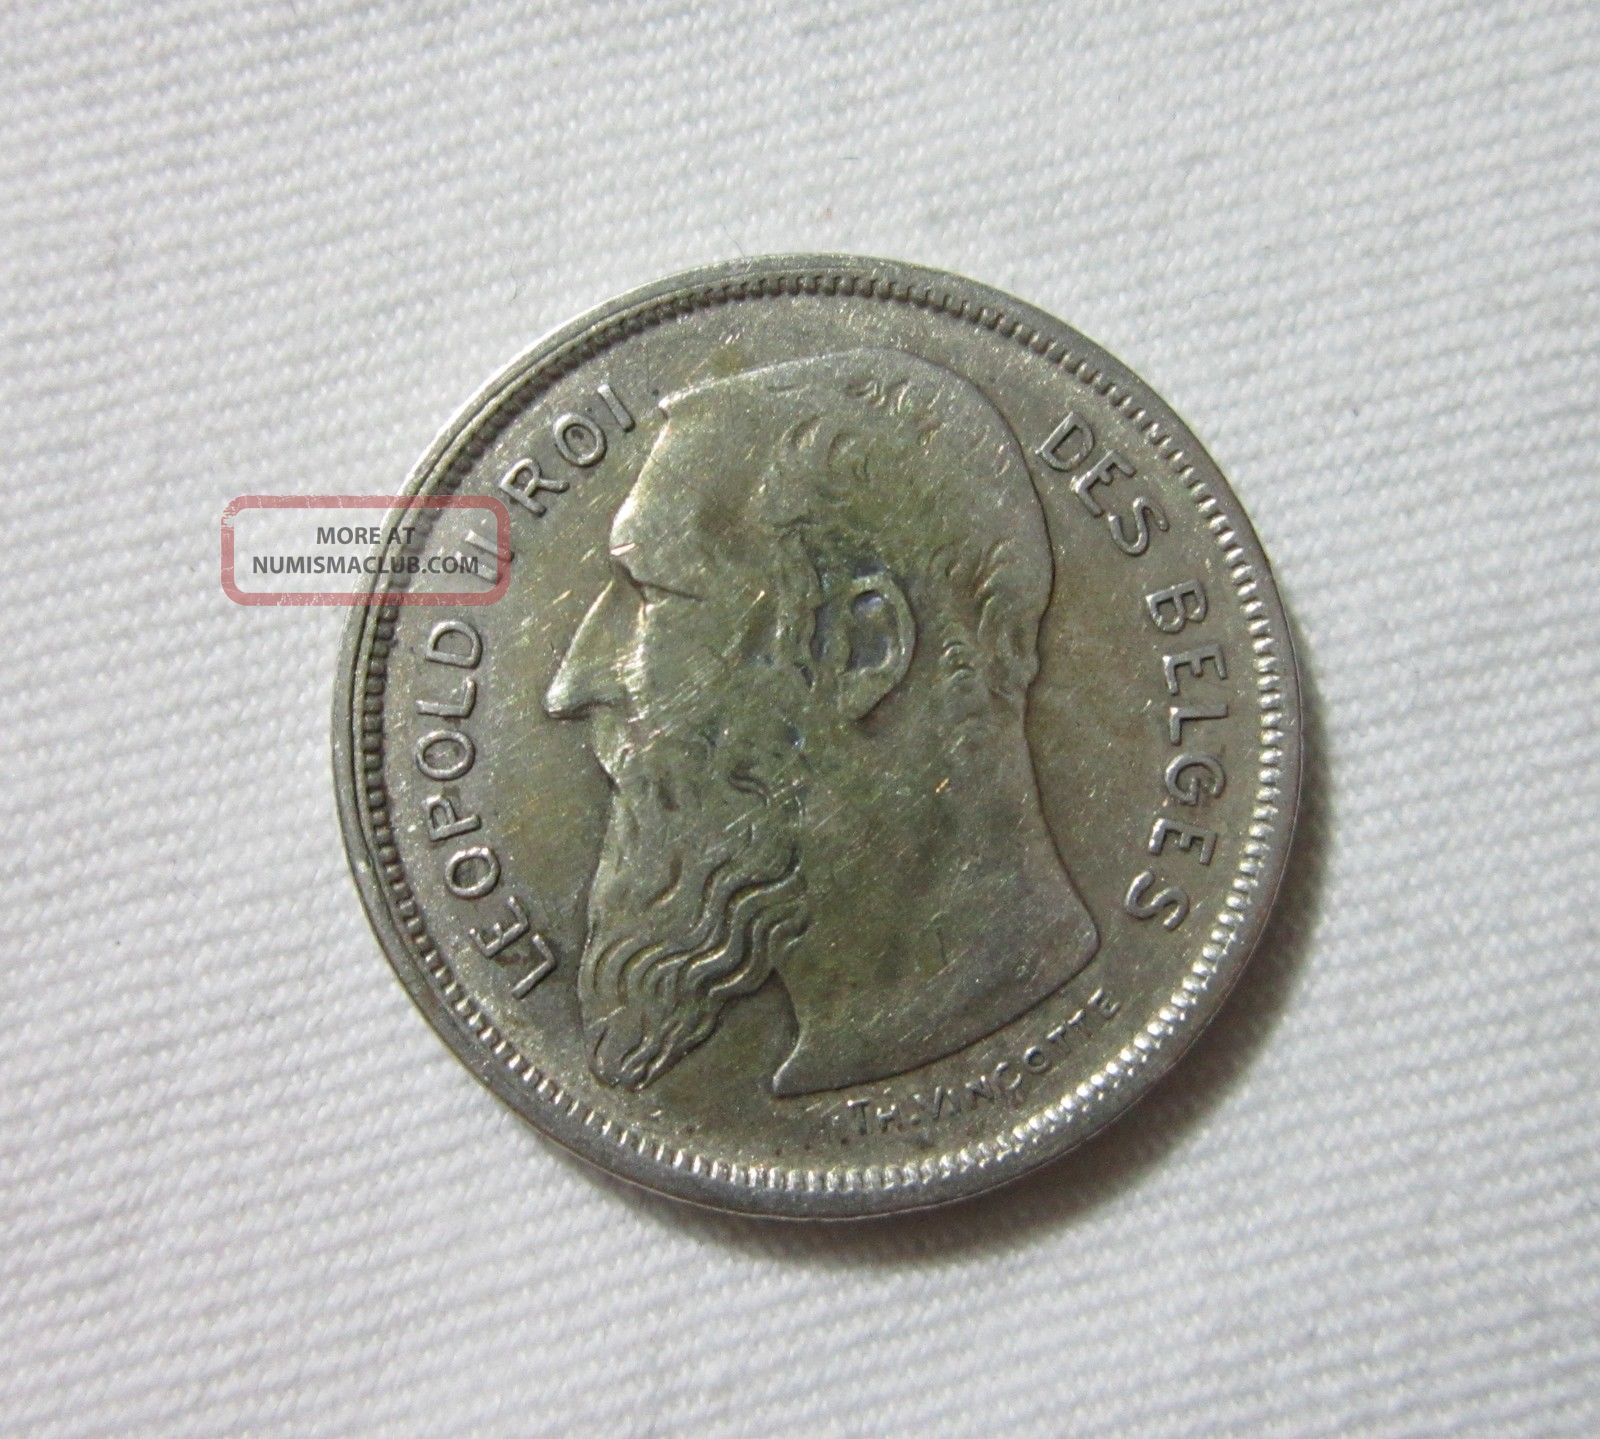 Belgium.  Silver 2 Francs,  1909. Europe photo